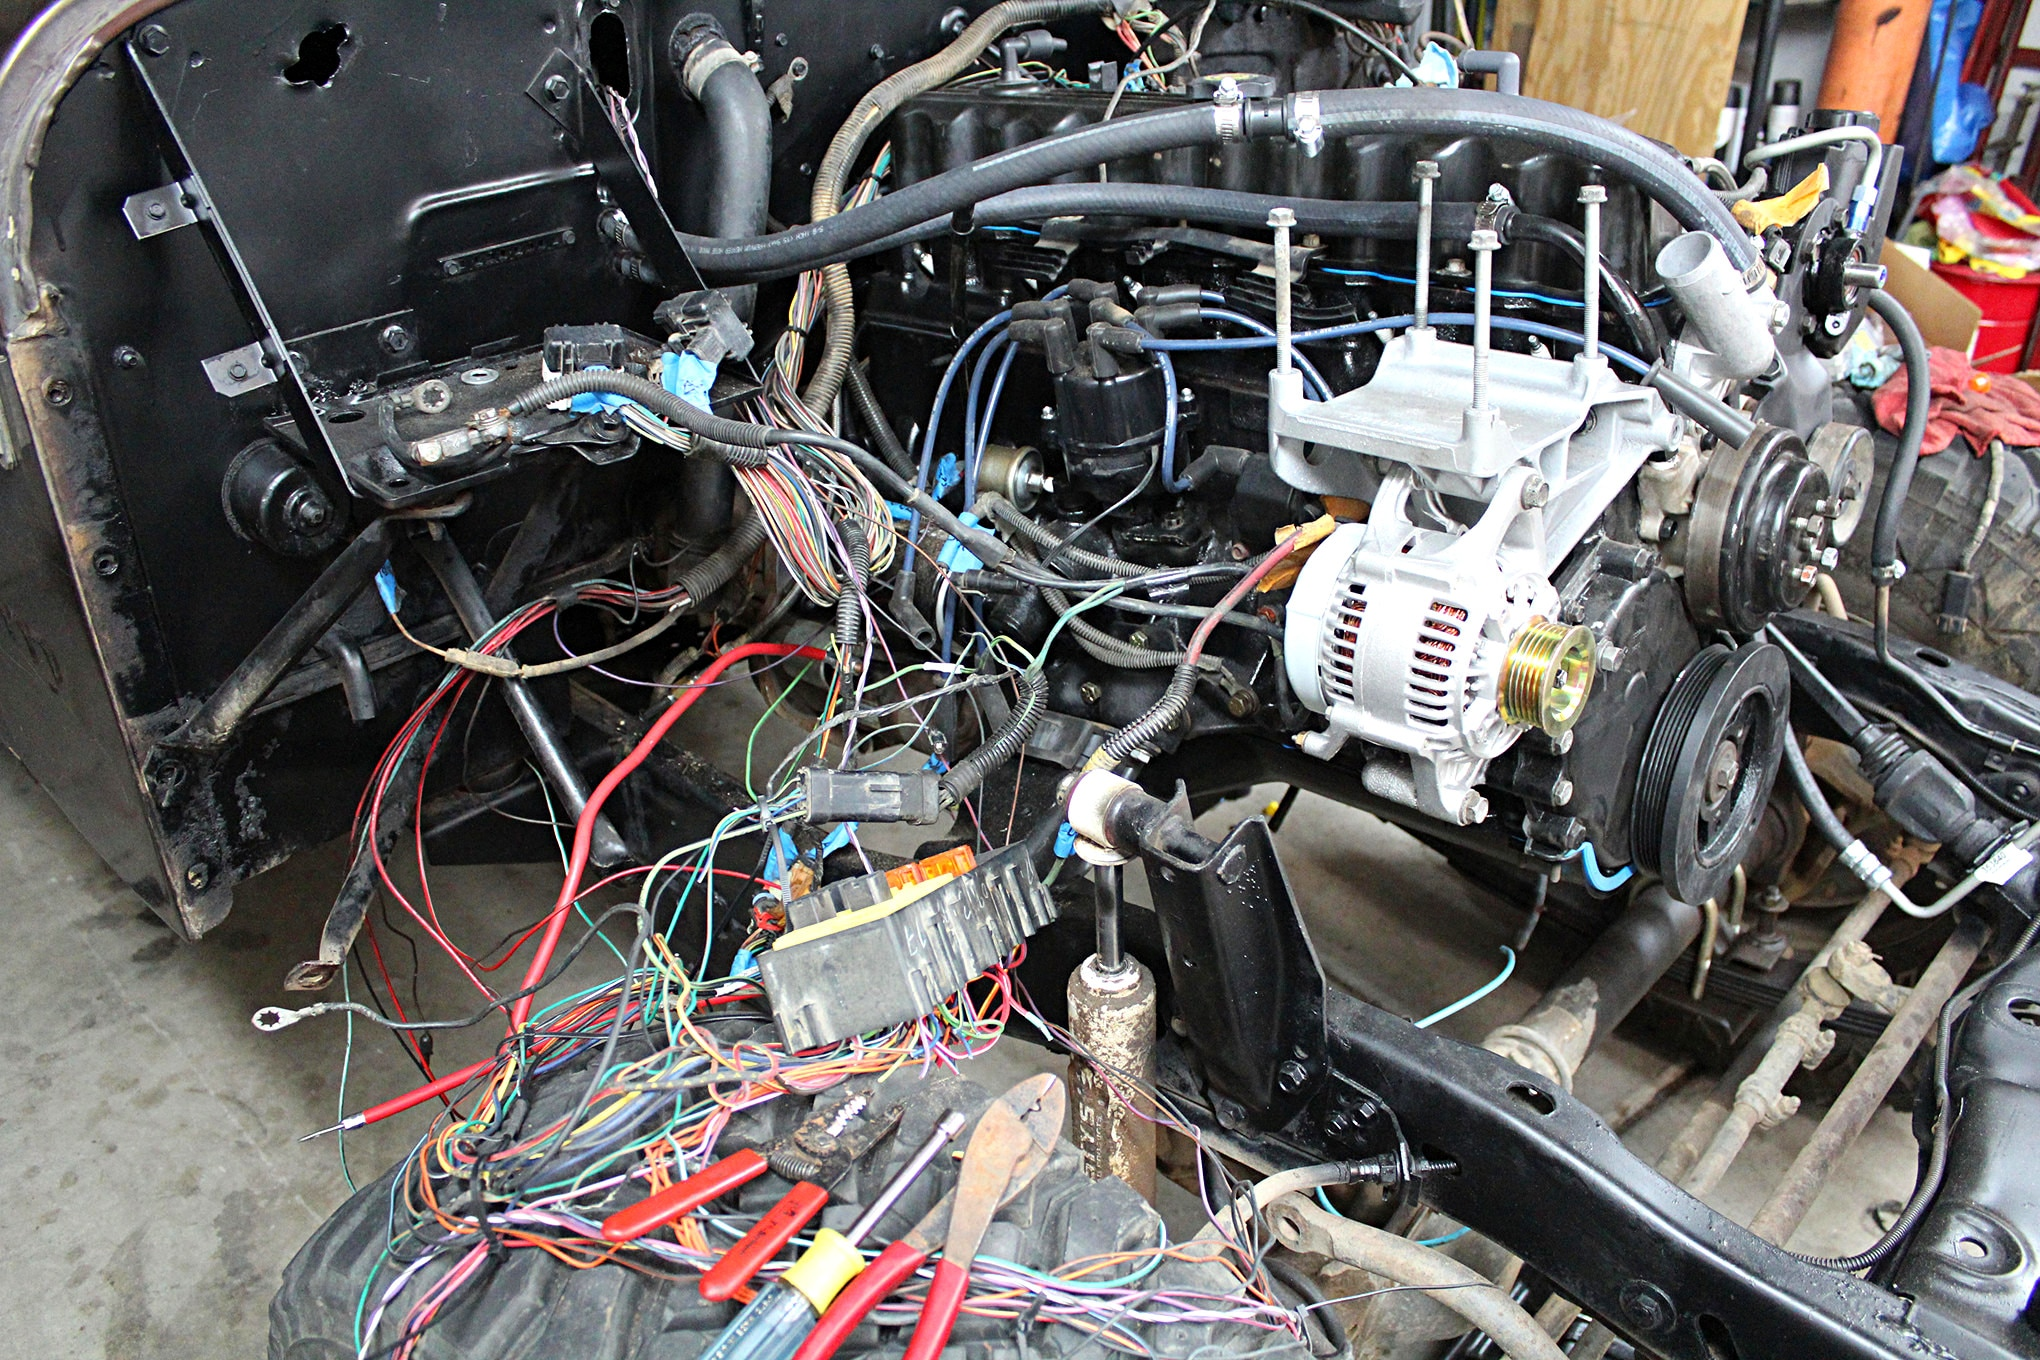 medium resolution of jeep cj 401 wiring swap schema diagram database jeep cj 401 wiring swap